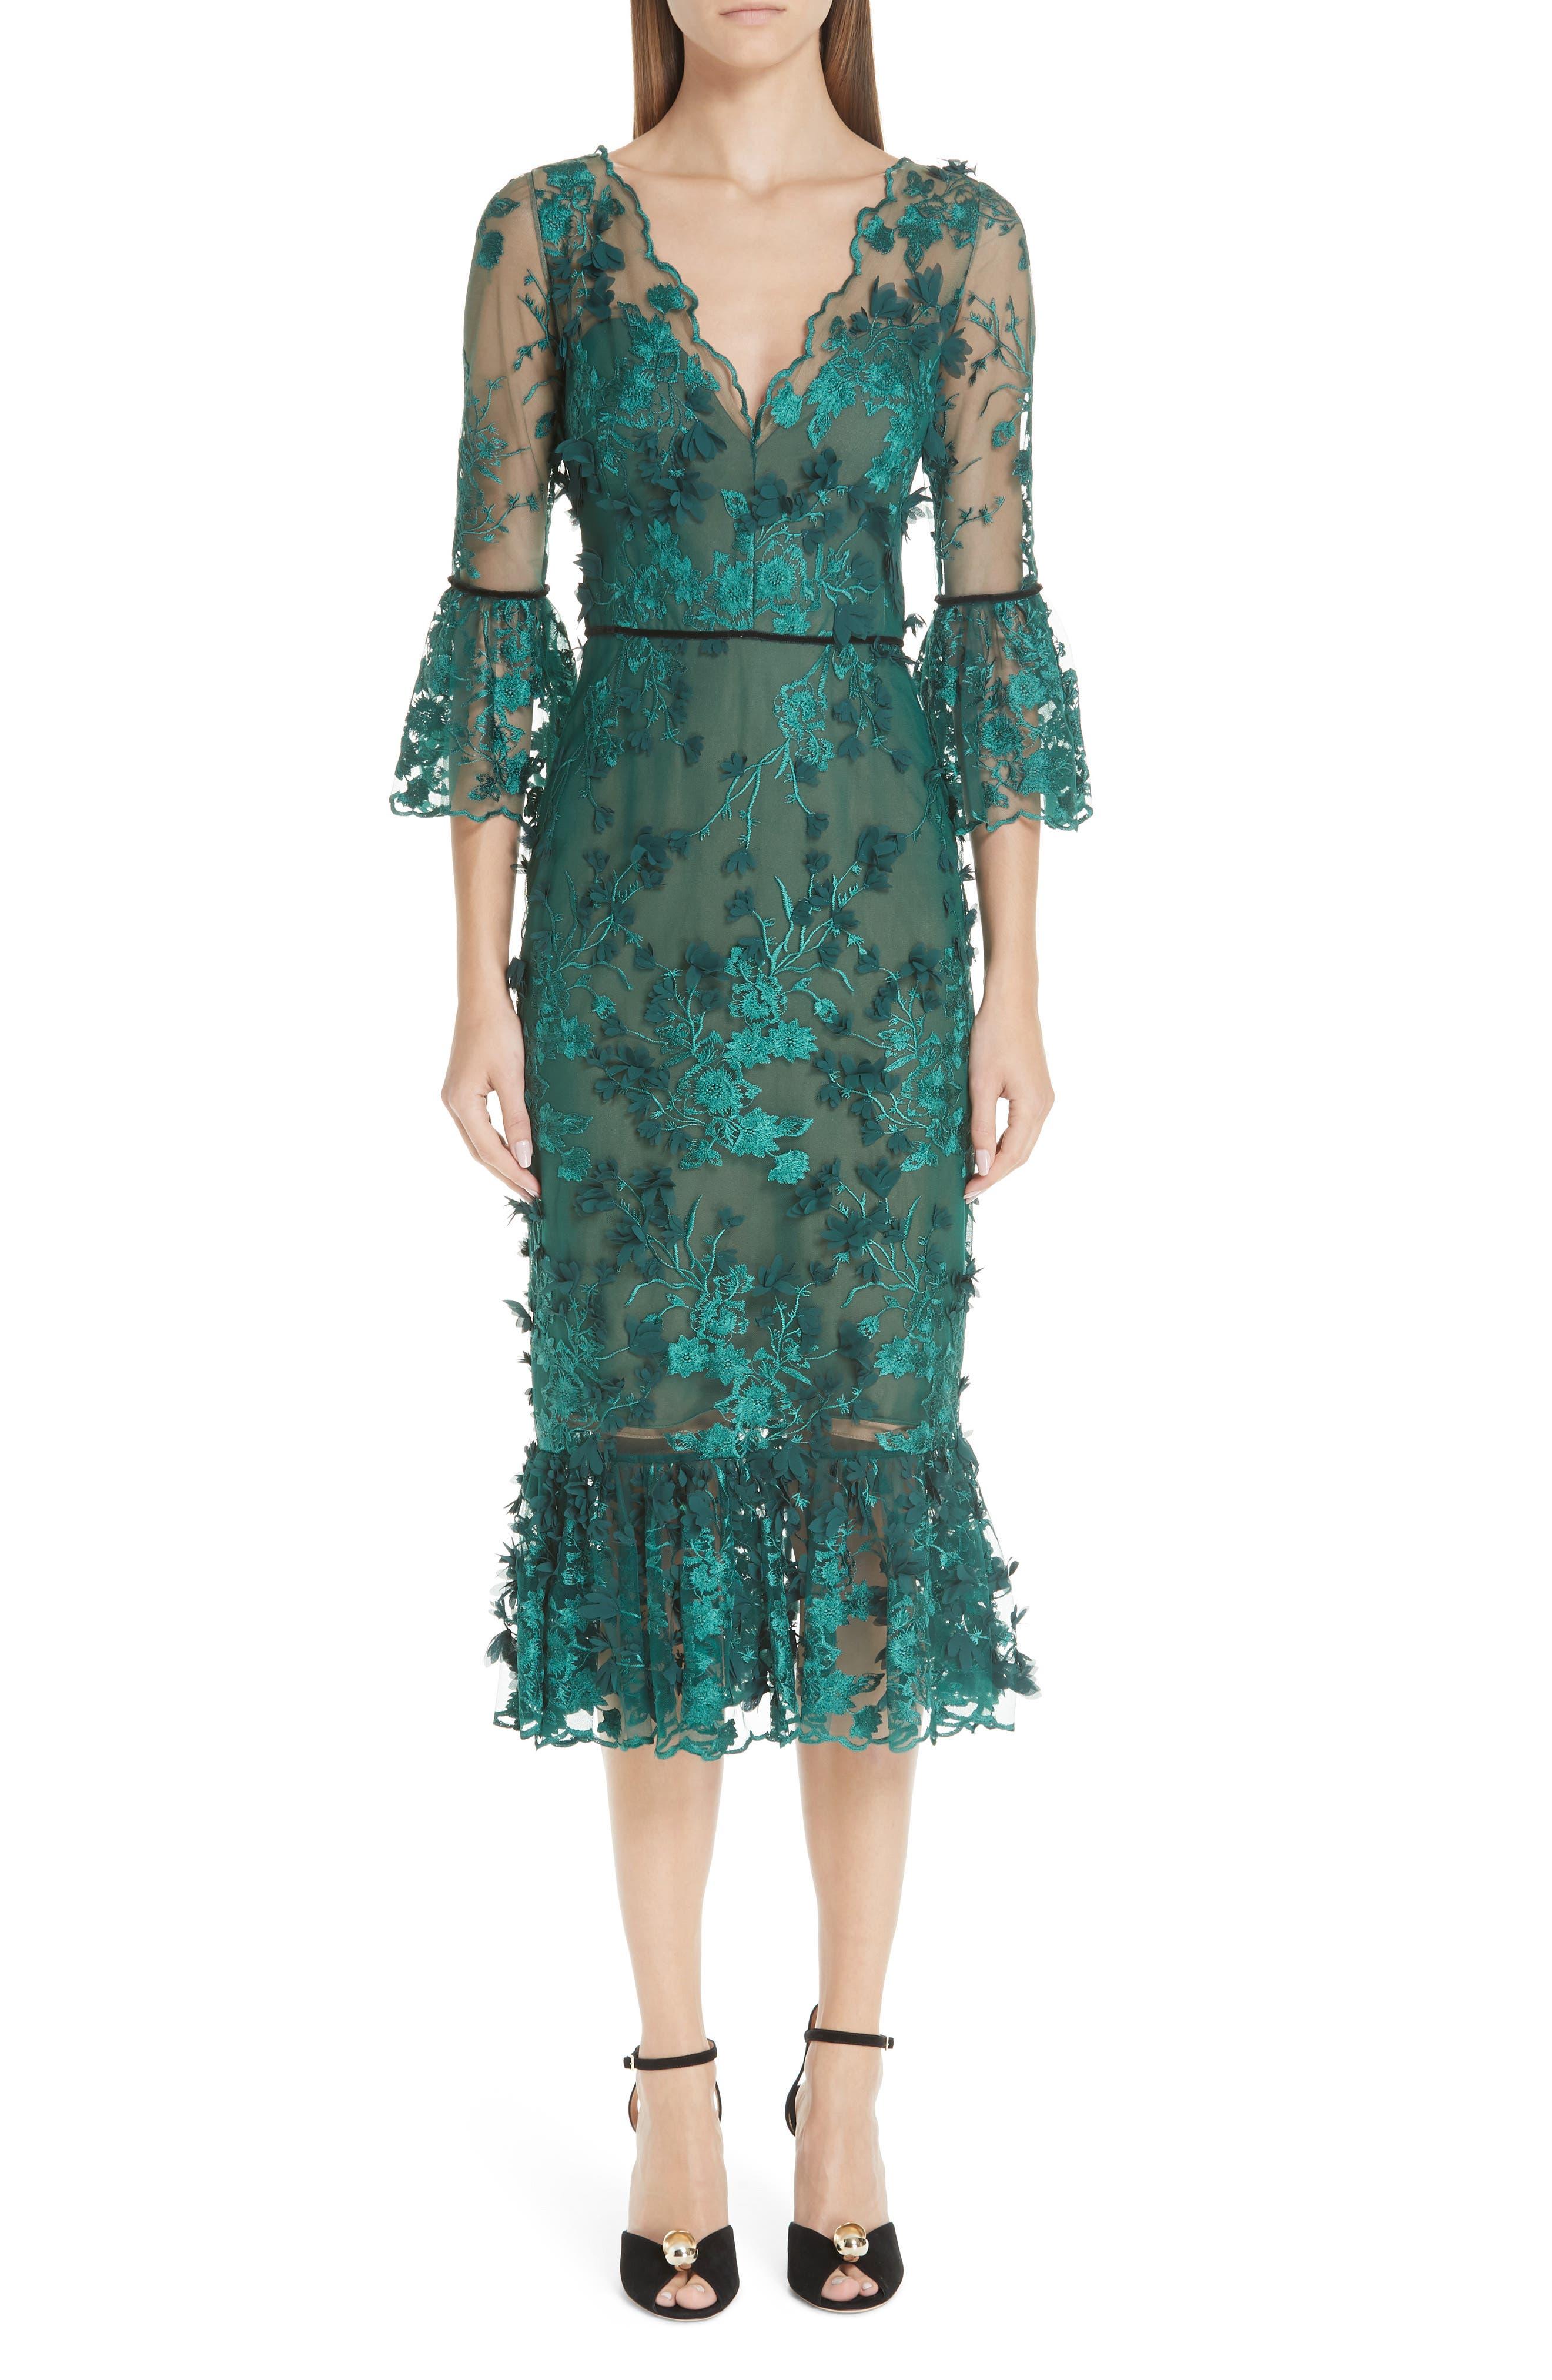 MARCHESA NOTTE Embroidered Ruffle Trim Sheath Dress, Main, color, 300